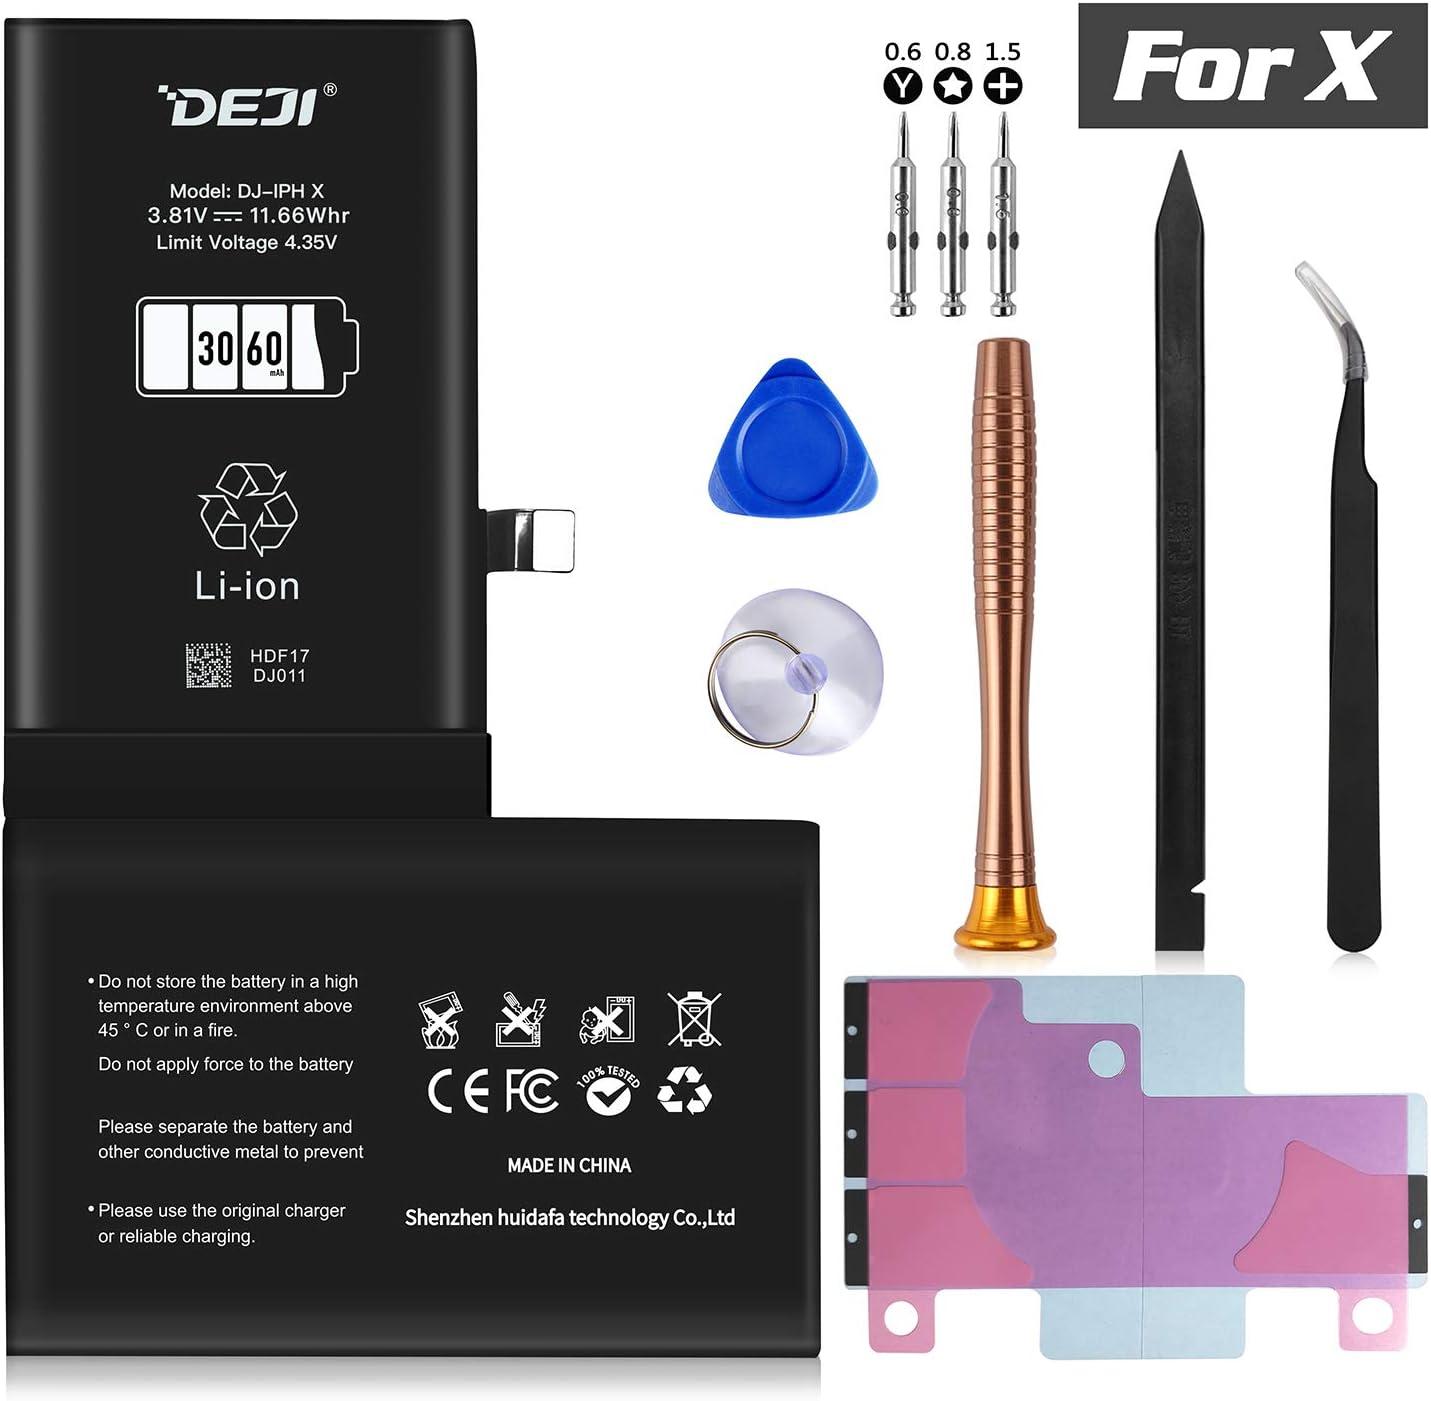 DEJI Battery for iPhone X, 3060mAh High Capacity Replacement Battery for iPhone X A1865, A1901, A1902, with Professional Repair Tool Kit and Instructions